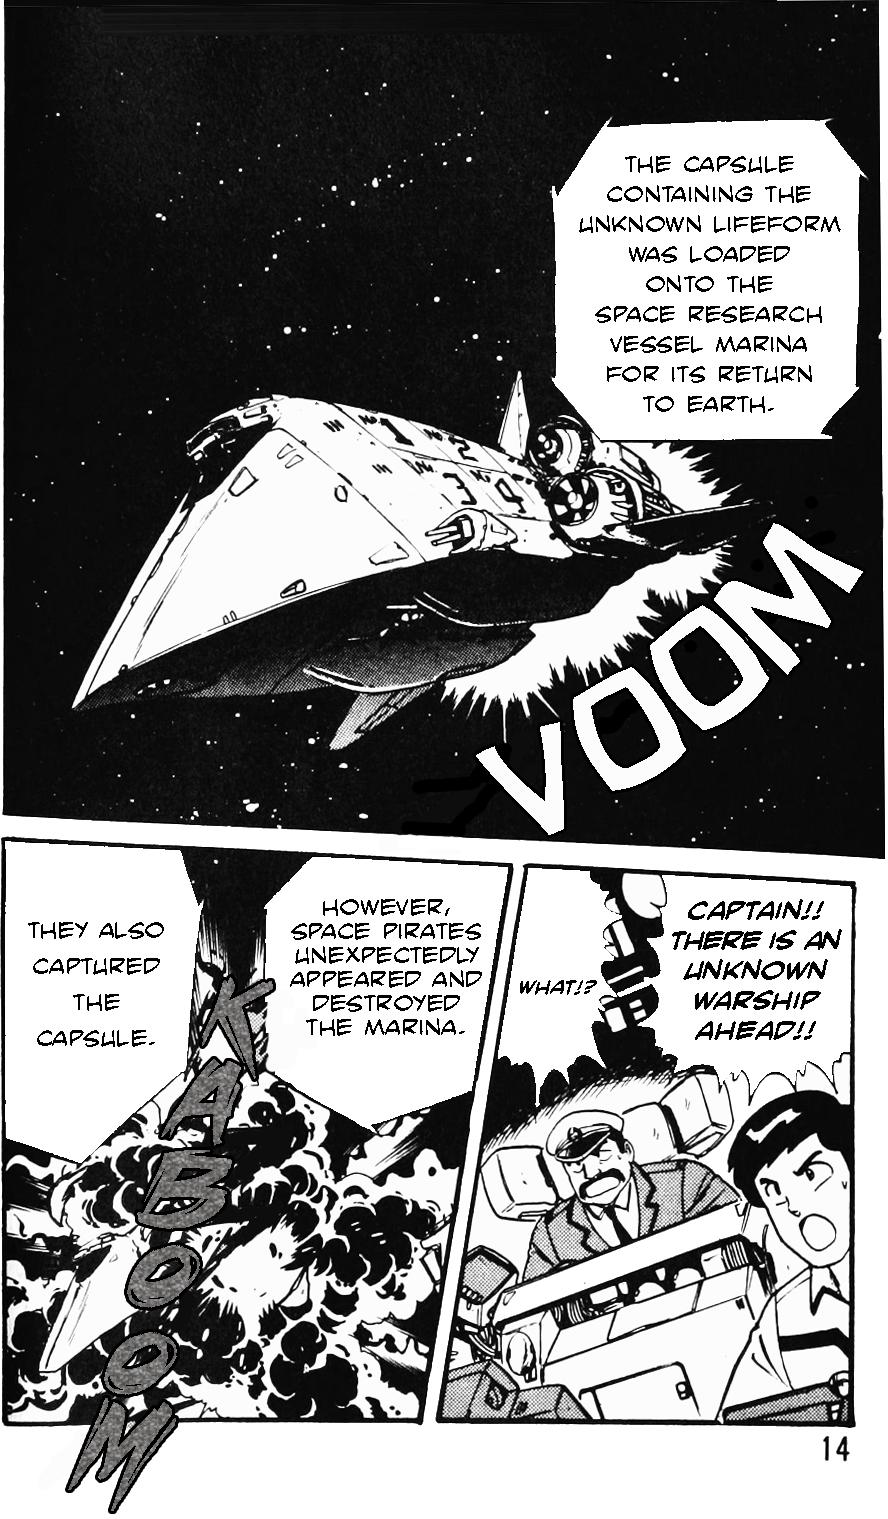 Space Research Vessel Marina